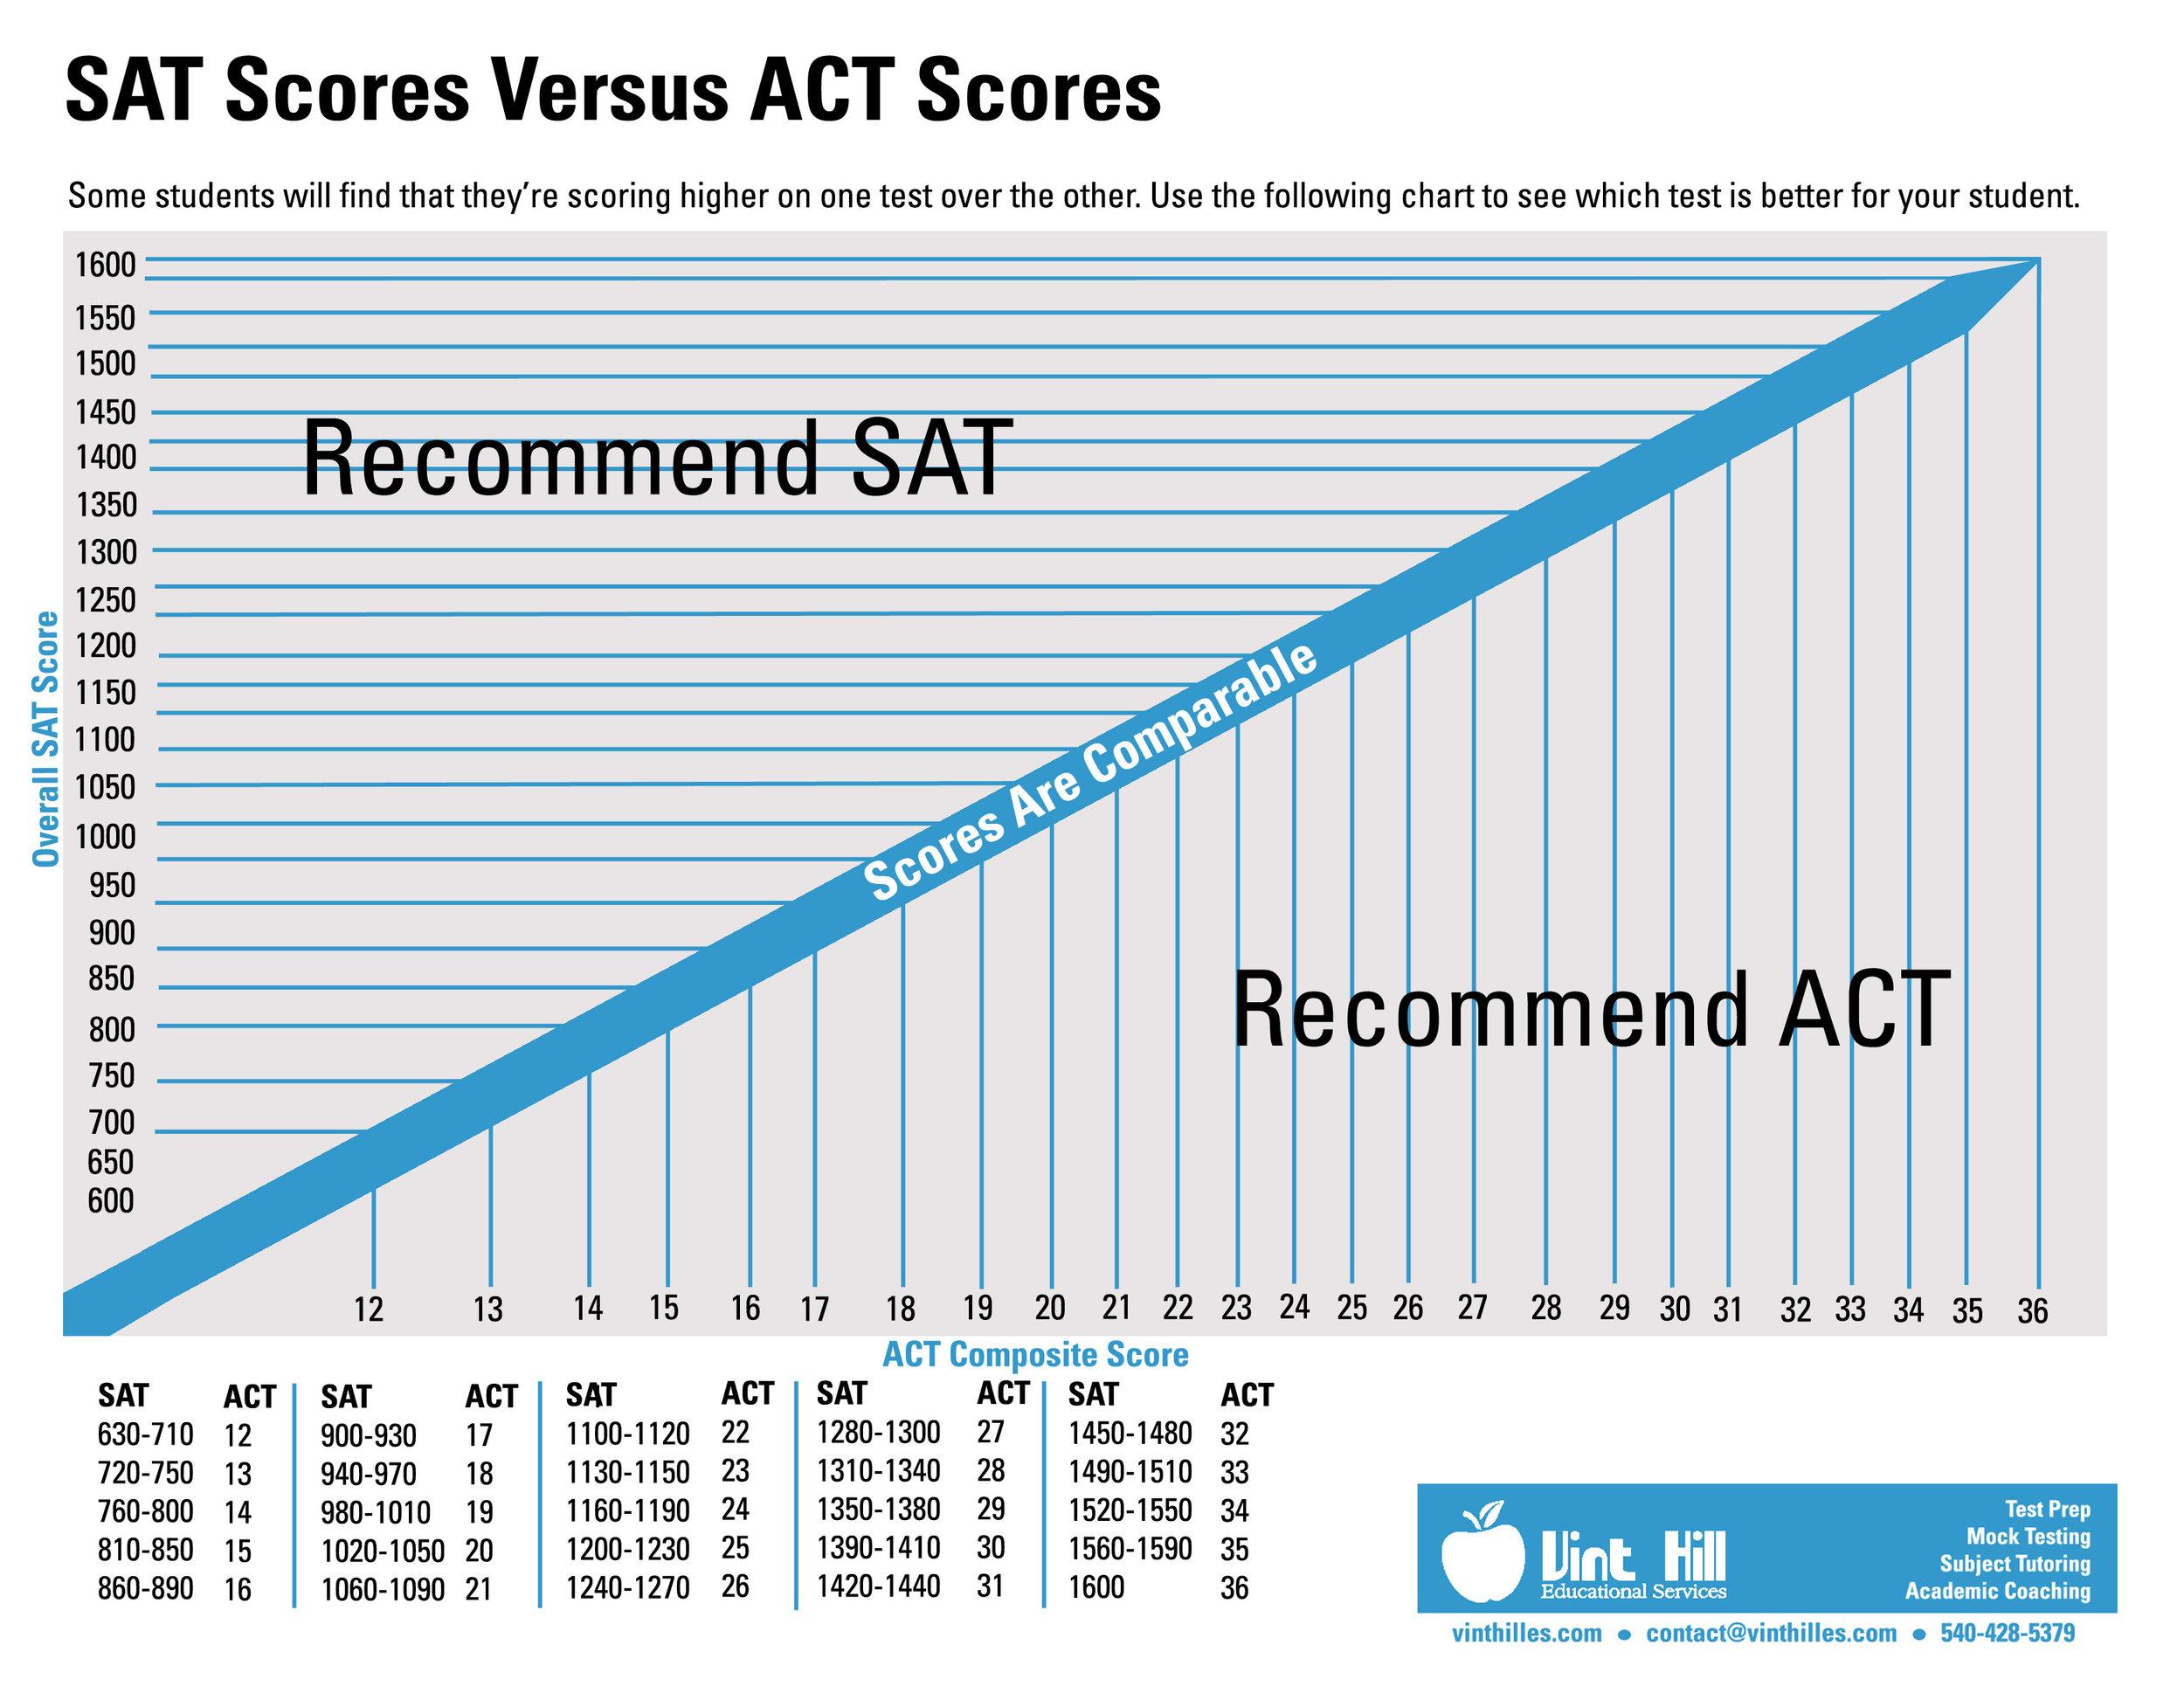 SAT Scores Versus ACT Scores - Concordance